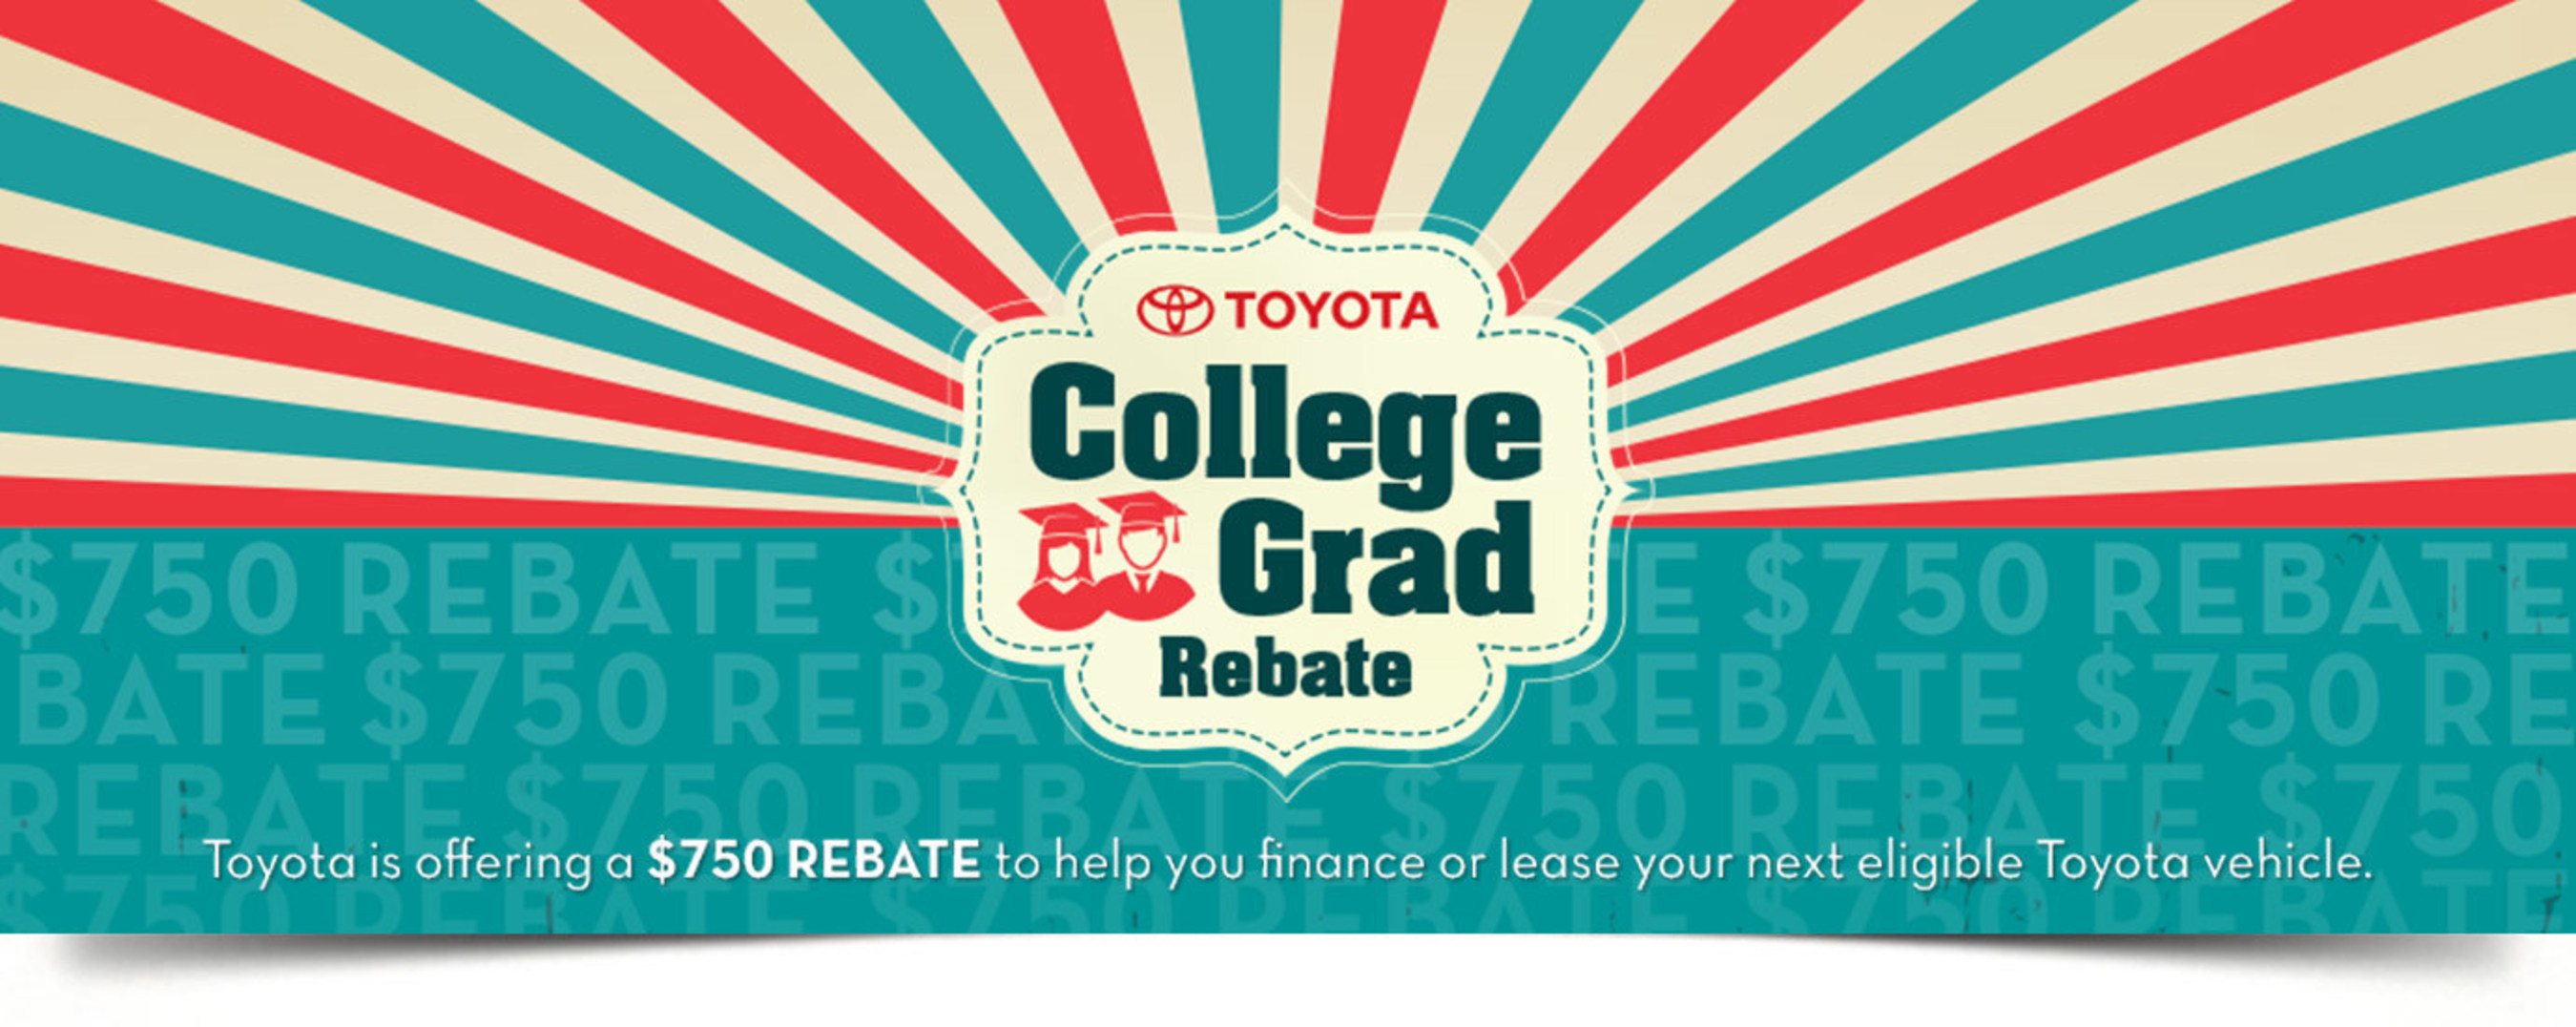 Serra Toyota participates in Toyota College Graduate Program